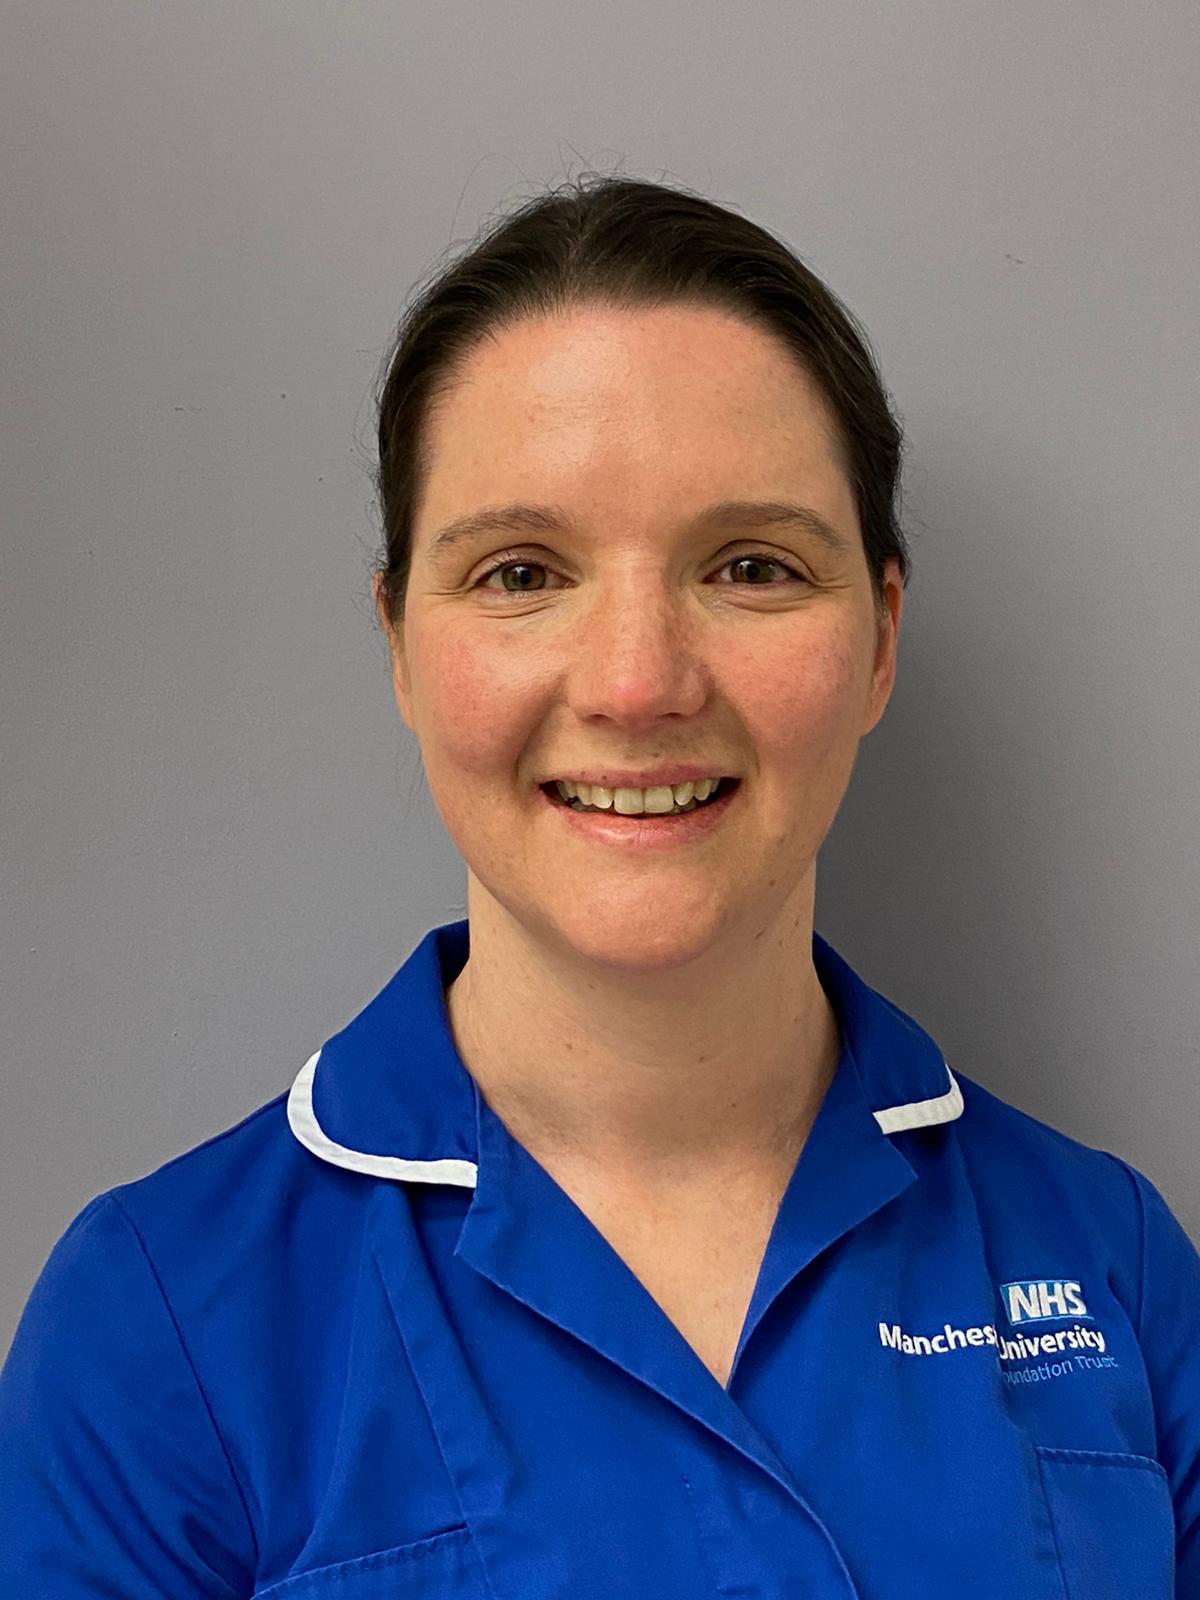 Photo of Sarah Lee, Research Midwifery Coordinator